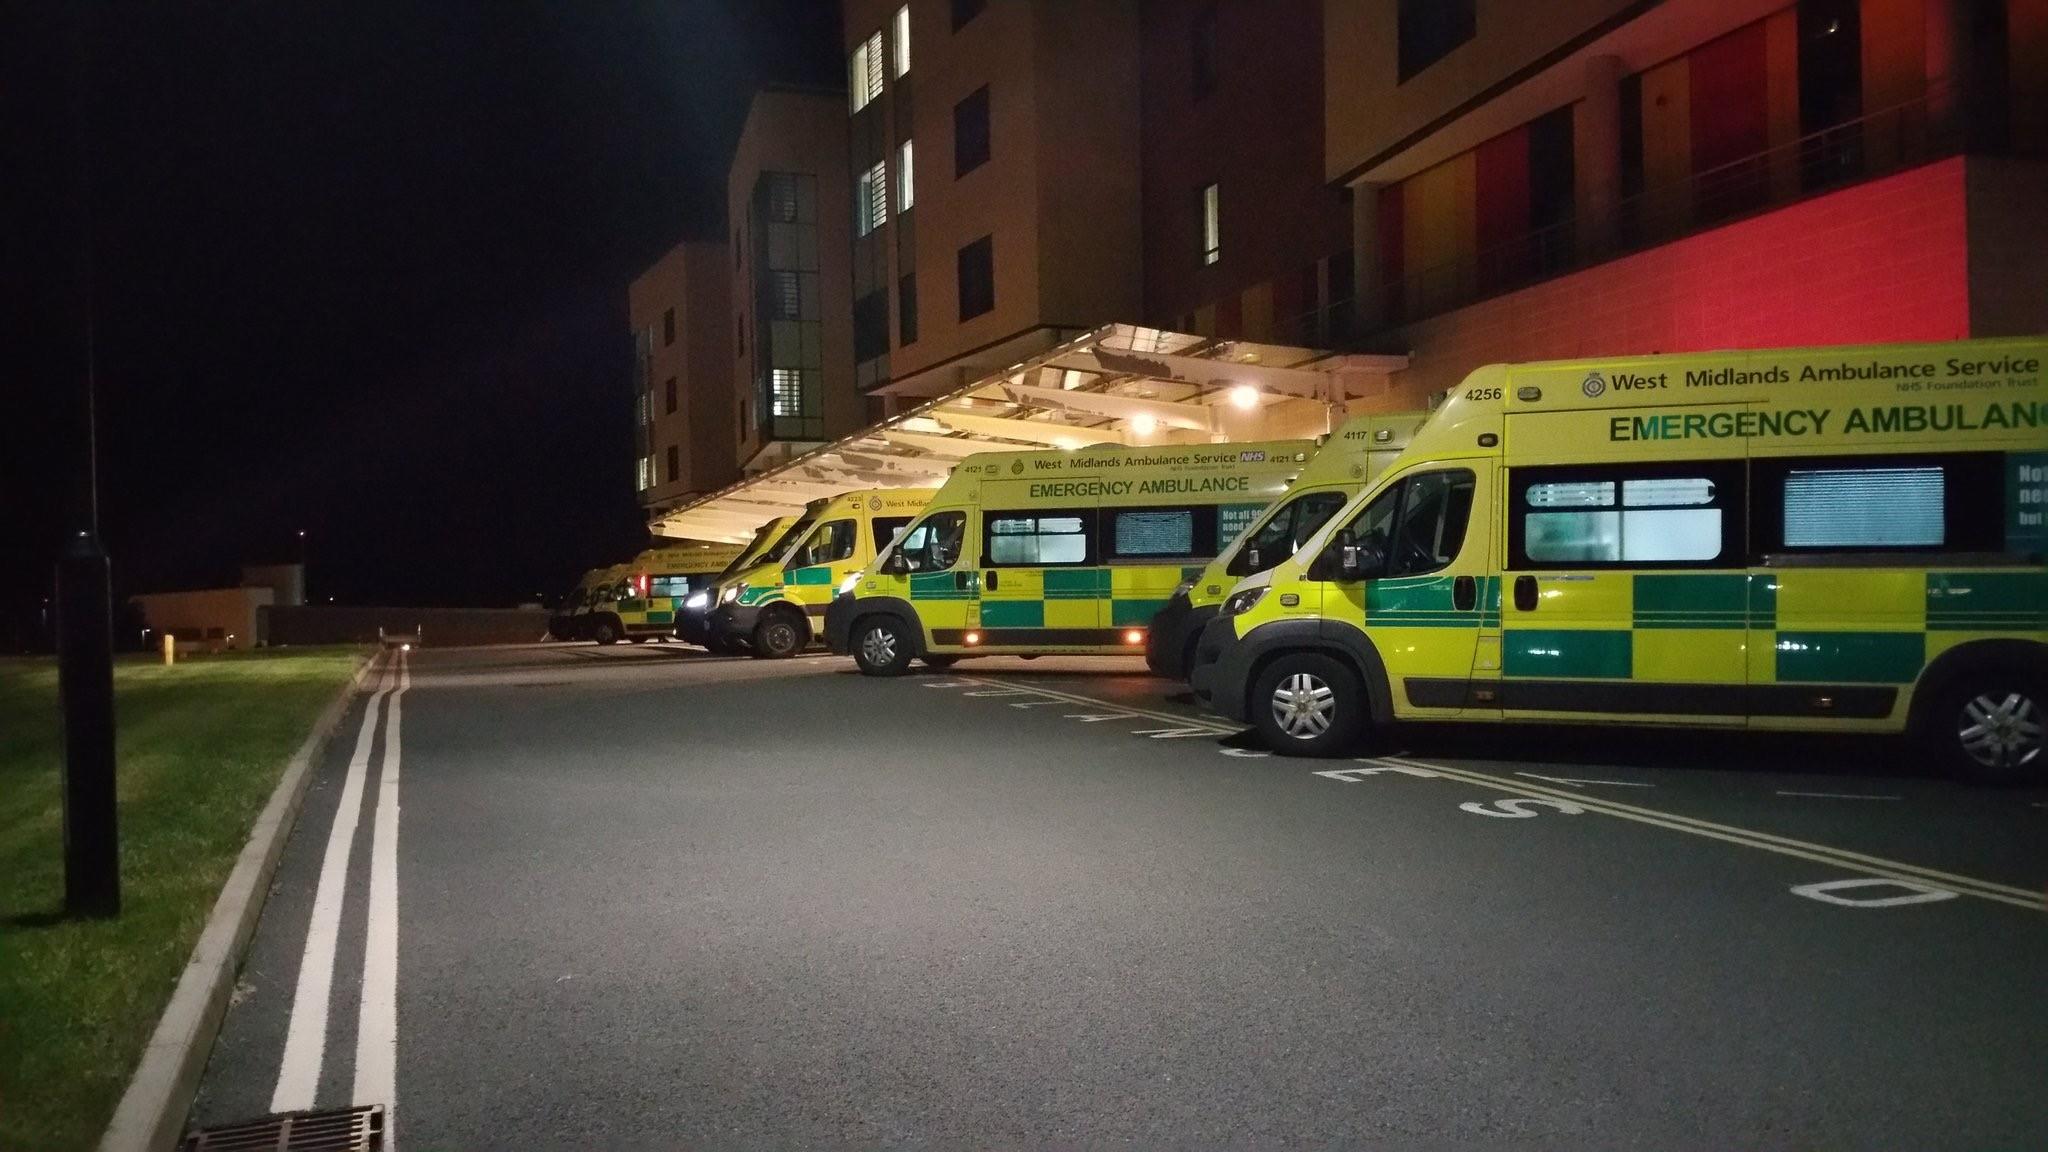 Hospital - RSUH at night